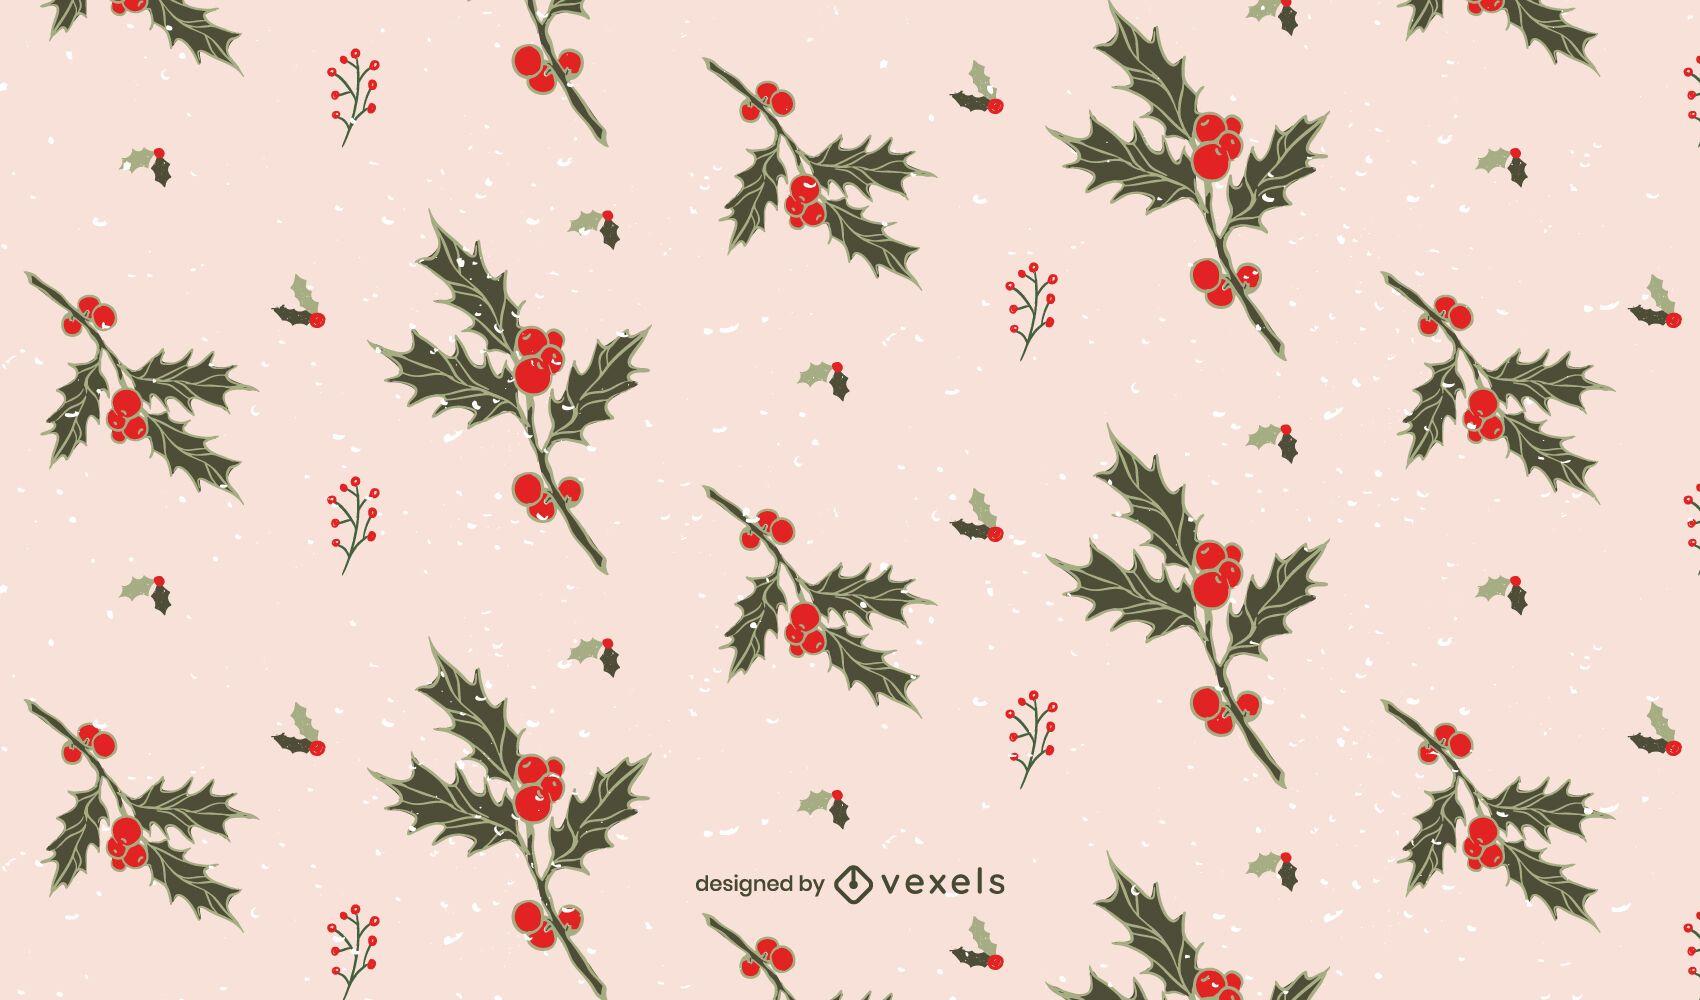 Mistletoe christmas pattern design